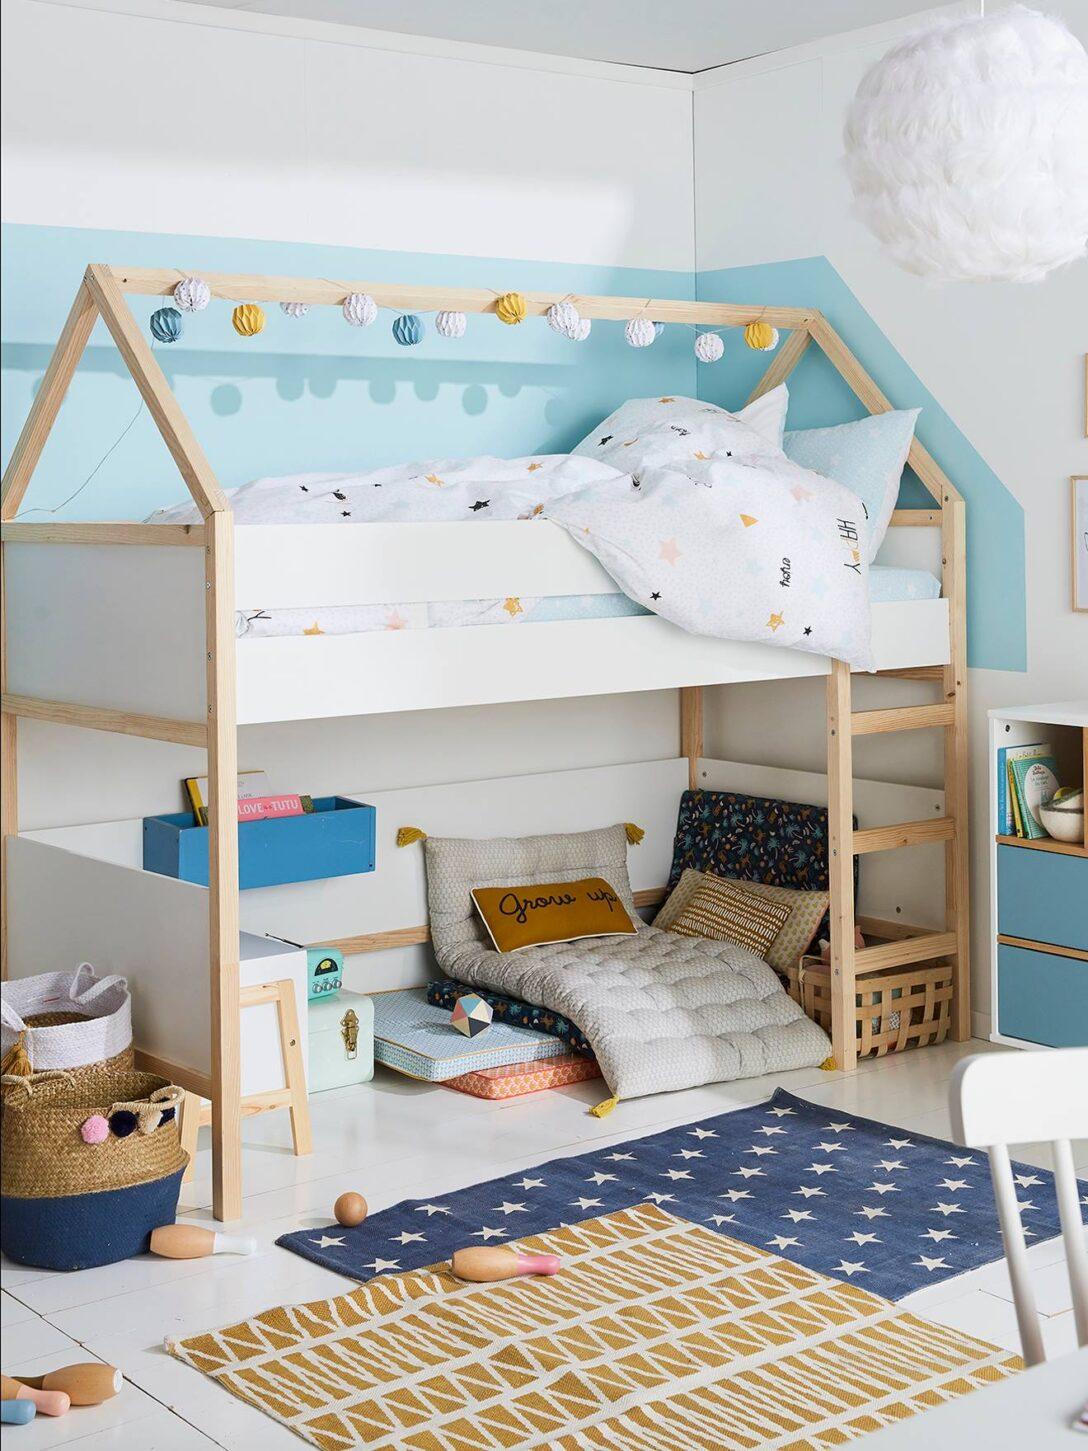 Large Size of Hochbetten Kinderzimmer Vertbaudet Hochbett Regal Sofa Weiß Regale Kinderzimmer Hochbetten Kinderzimmer